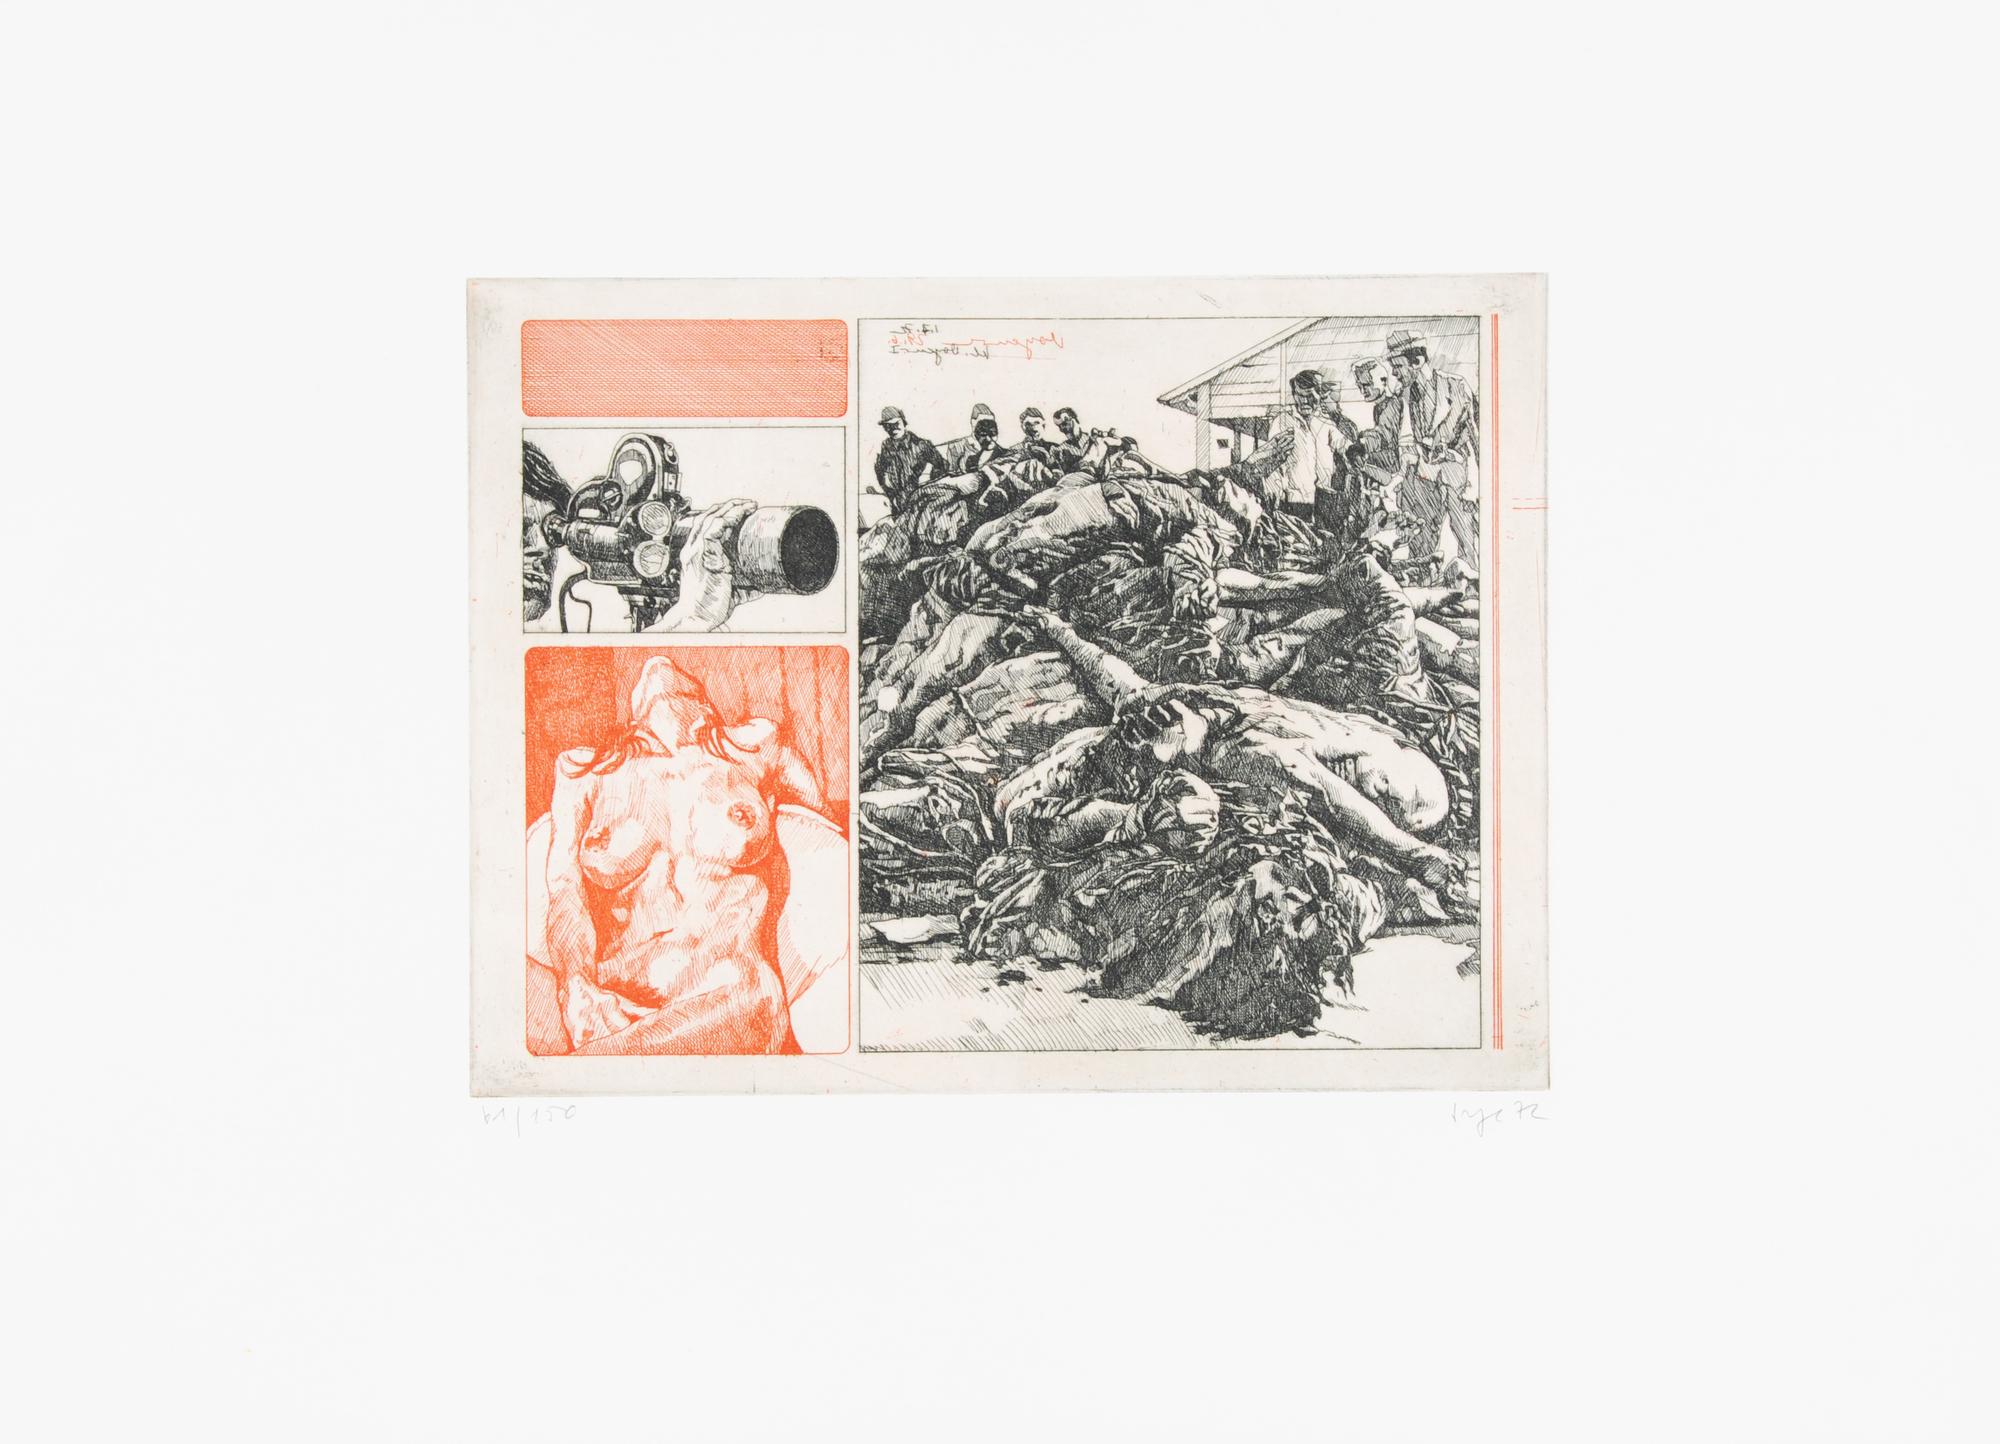 Sorge Peter, 7 sheets: Blow up, 1970; Bomber, 1970; Power, 1970; Ohne Title, 1971; Kleiner Voyeur, 1972; Untitled, 1972; Untitled